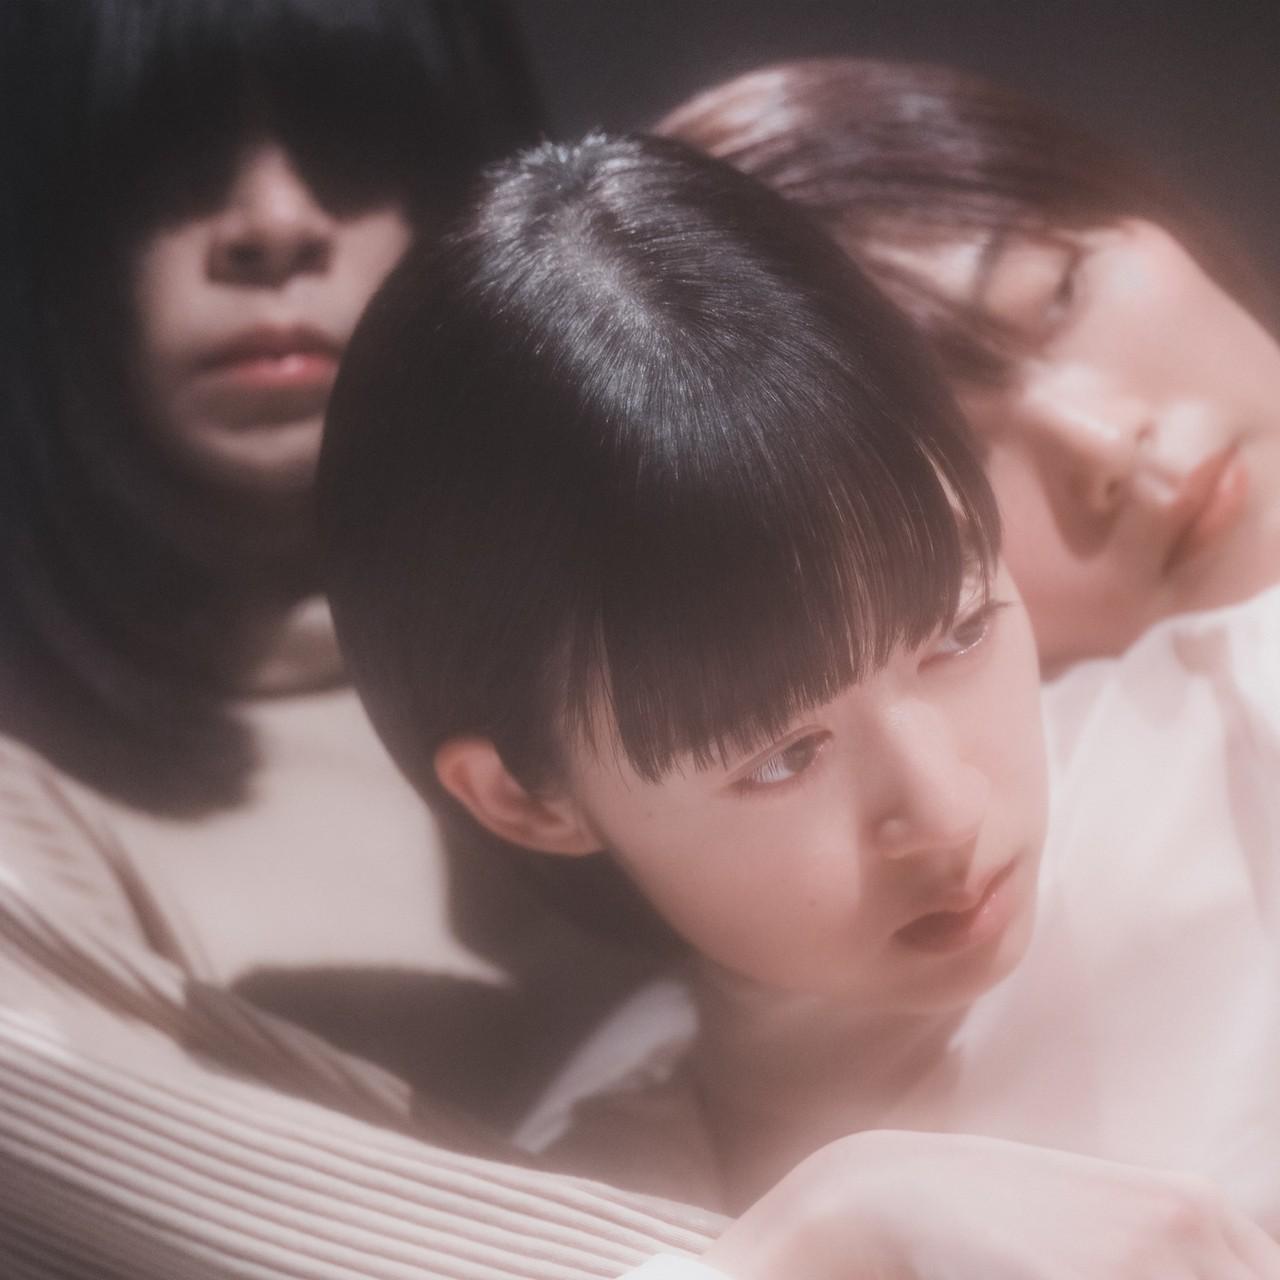 [Album] 羊文学 (Hitsuji Bungaku) – POWERS [CD FLAC] [2020.12.09]